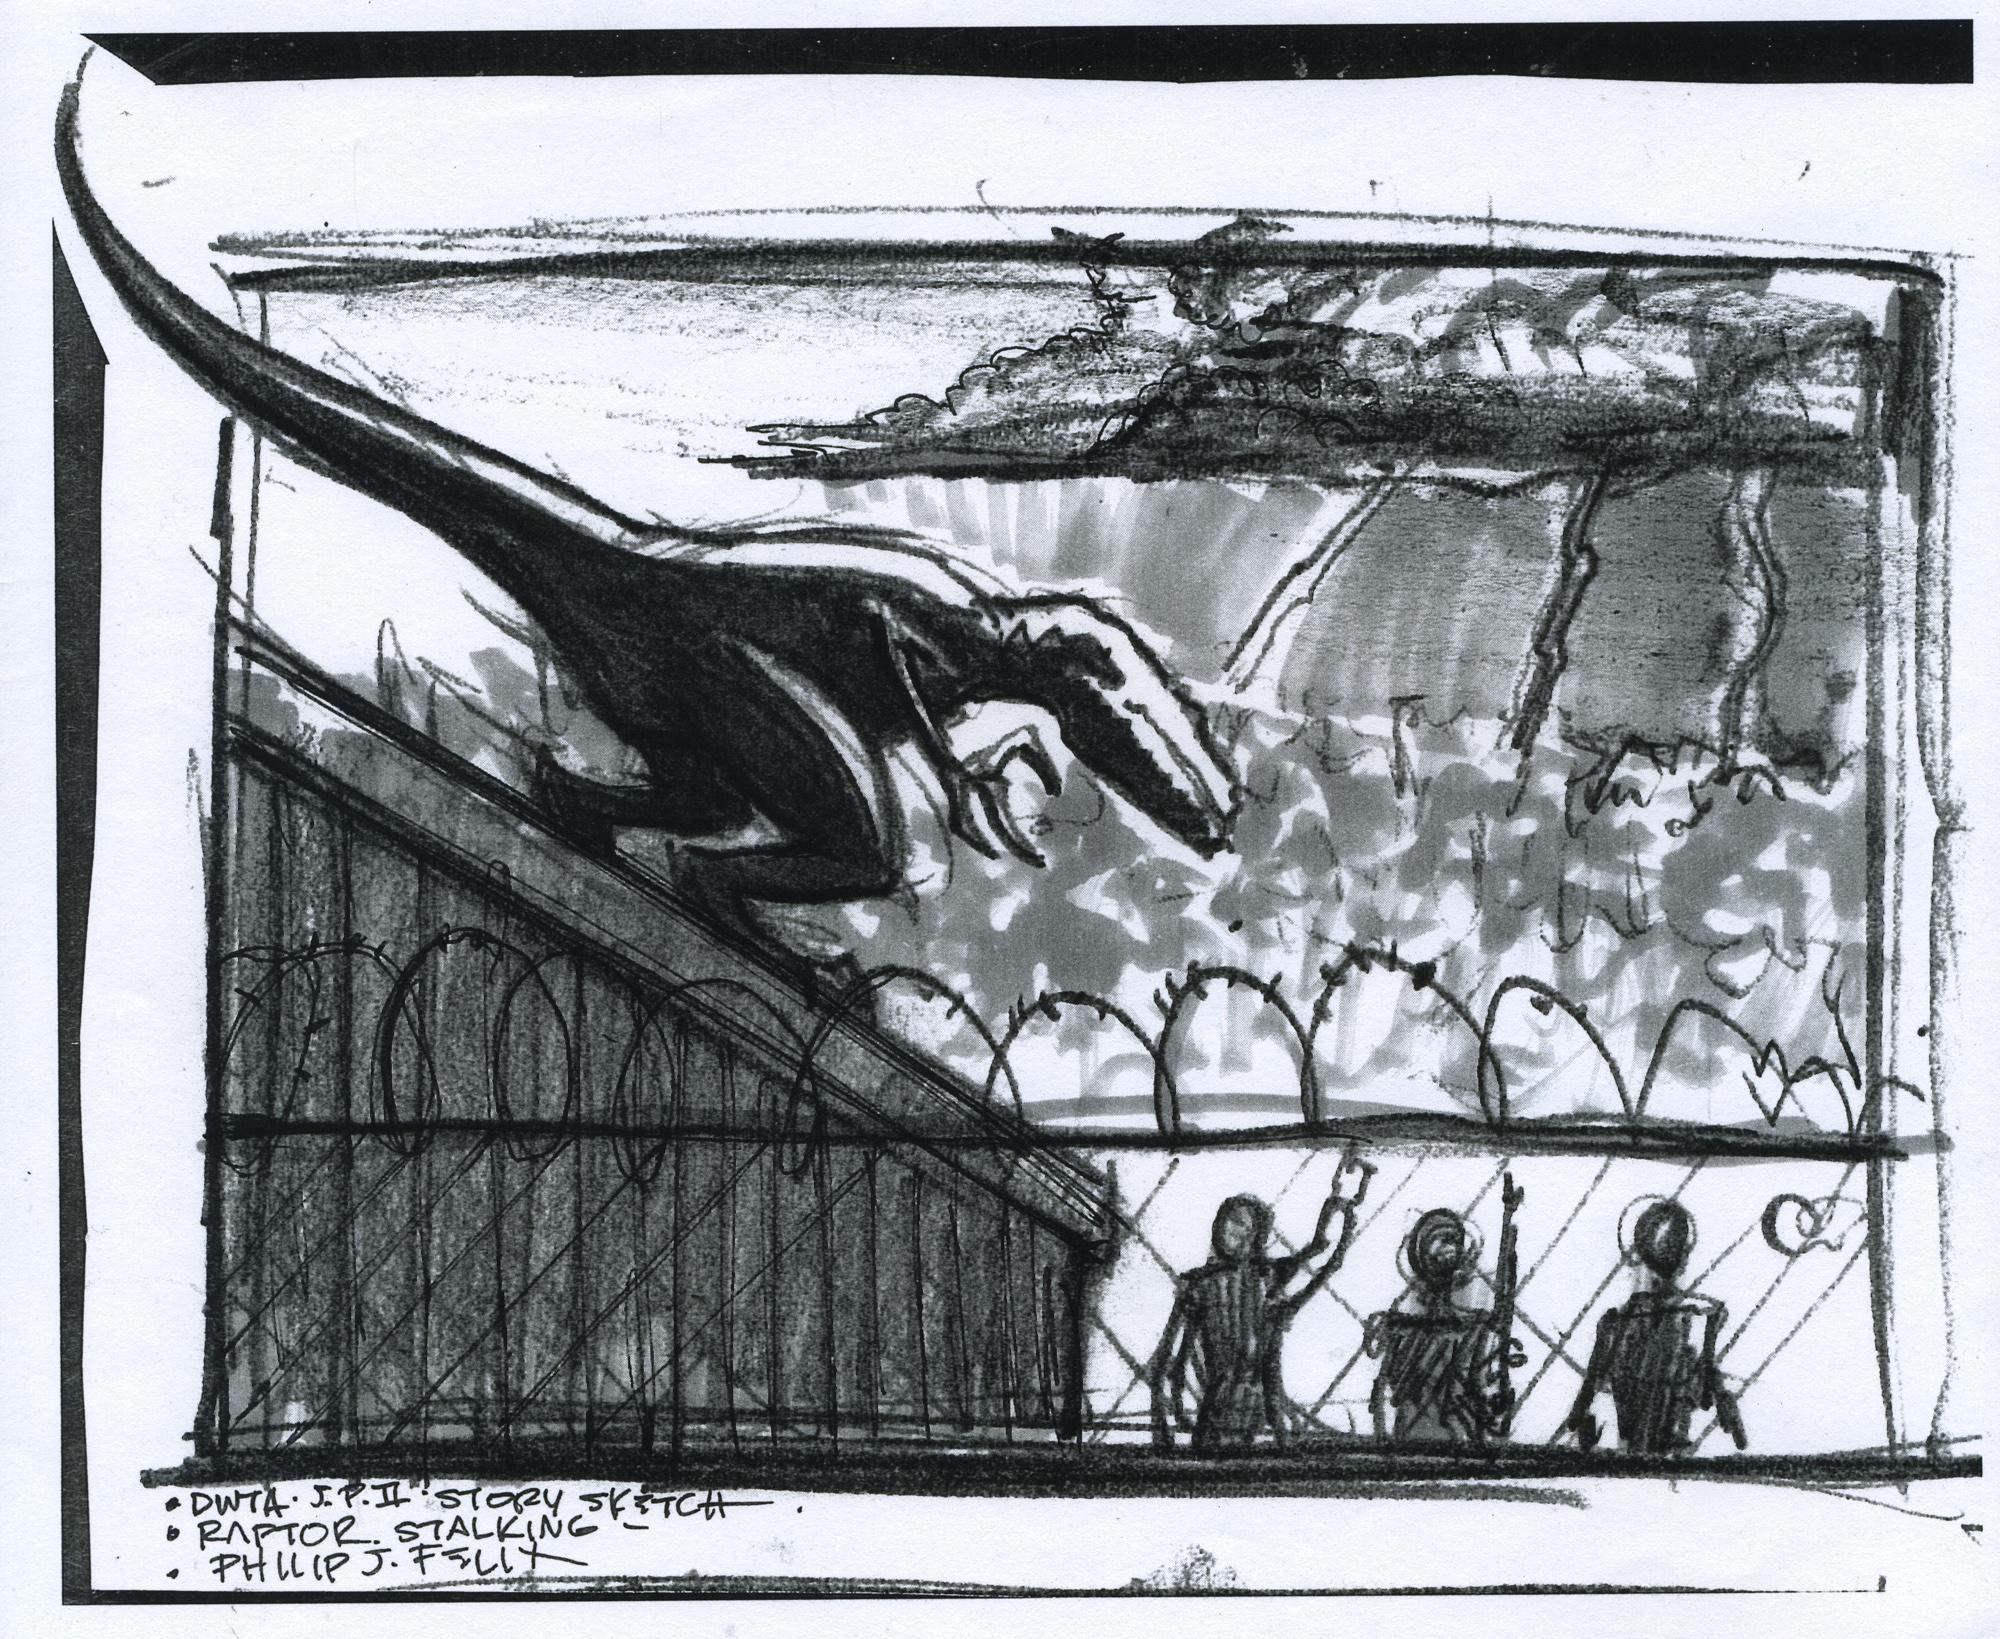 Jurassic Park Storyboard.